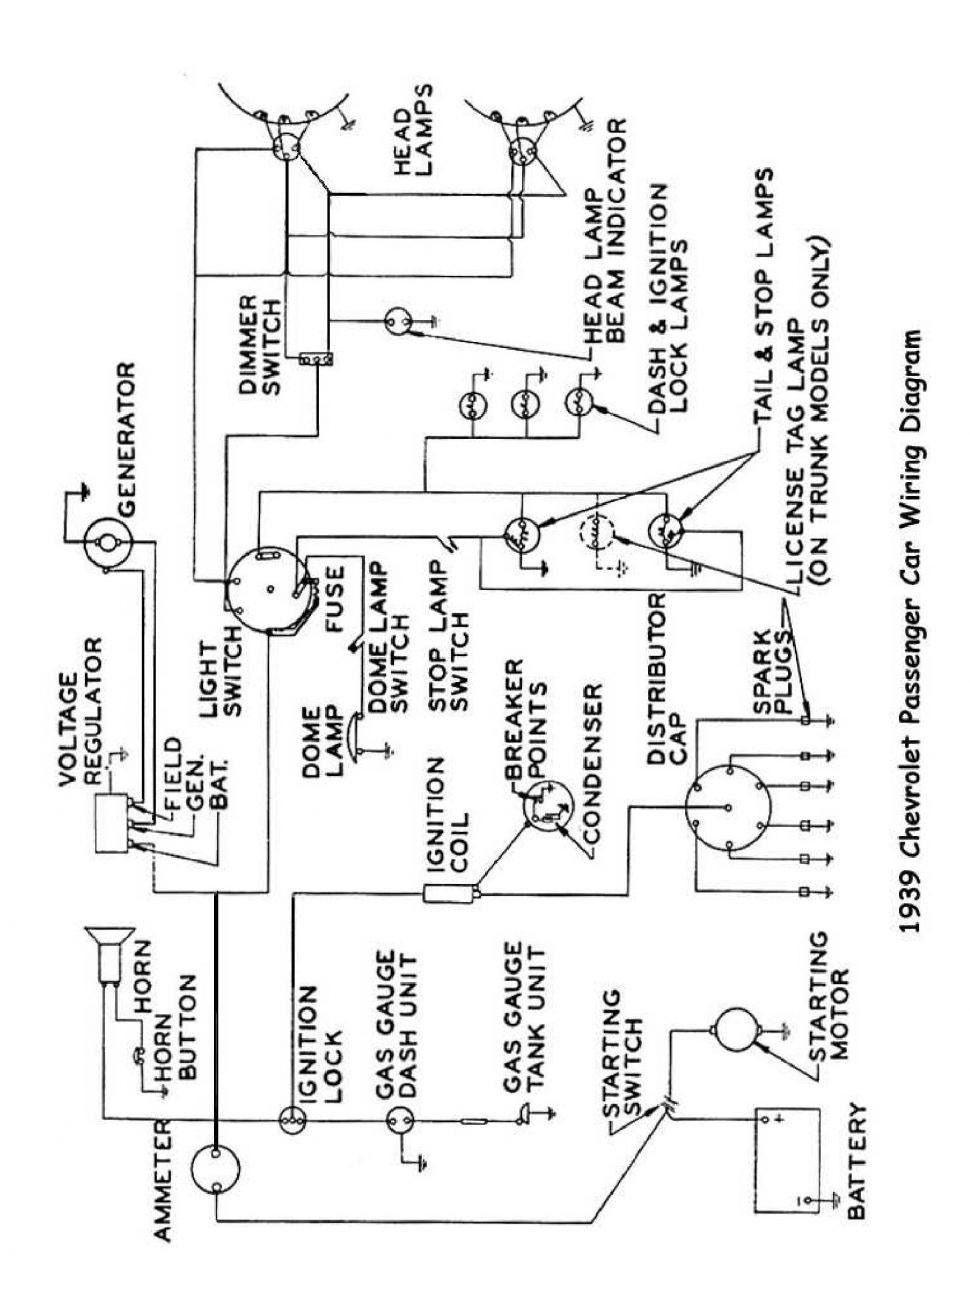 Ultra Remote Car Starter Wiring Diagram | Wiringdiagram - Remote Car Starter Wiring Diagram